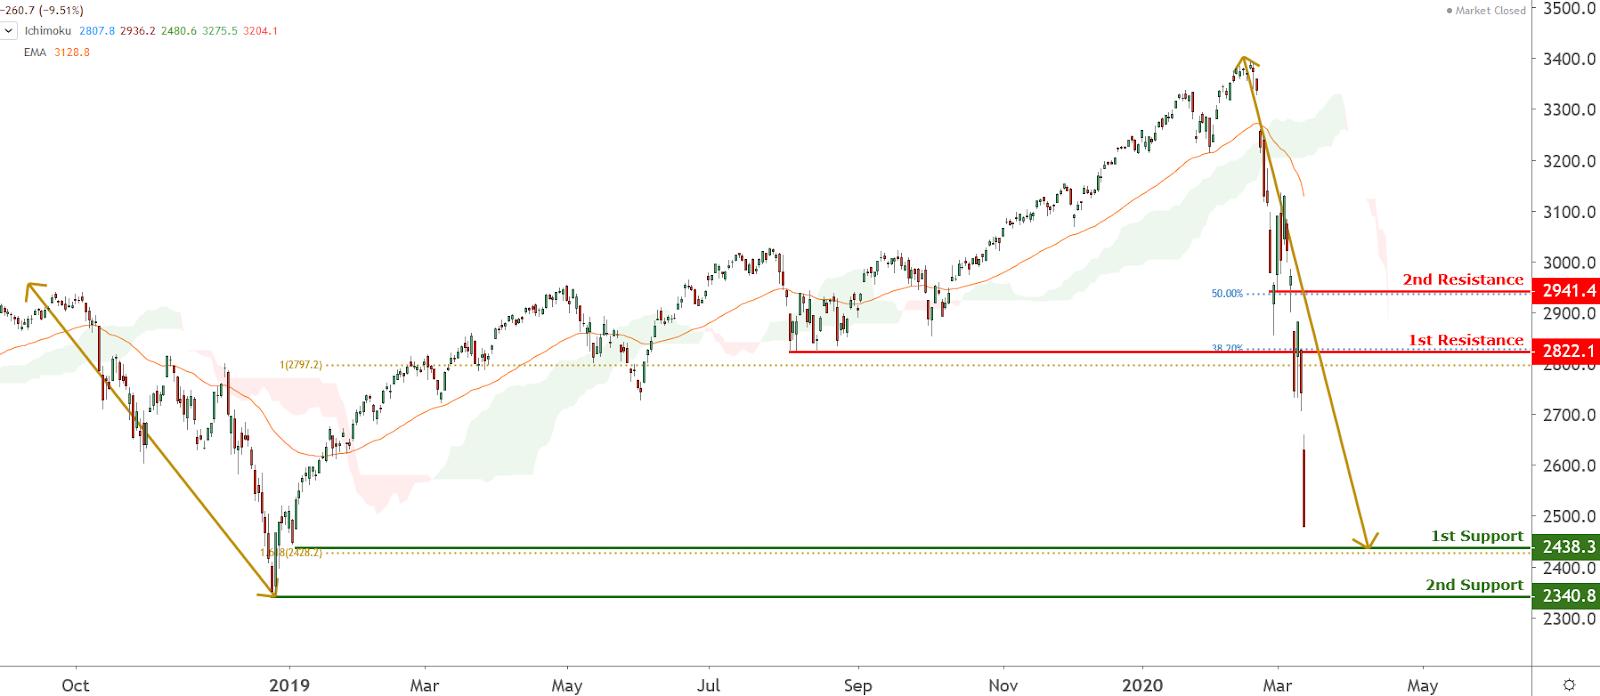 SPX Chart, Source: TradingView.com